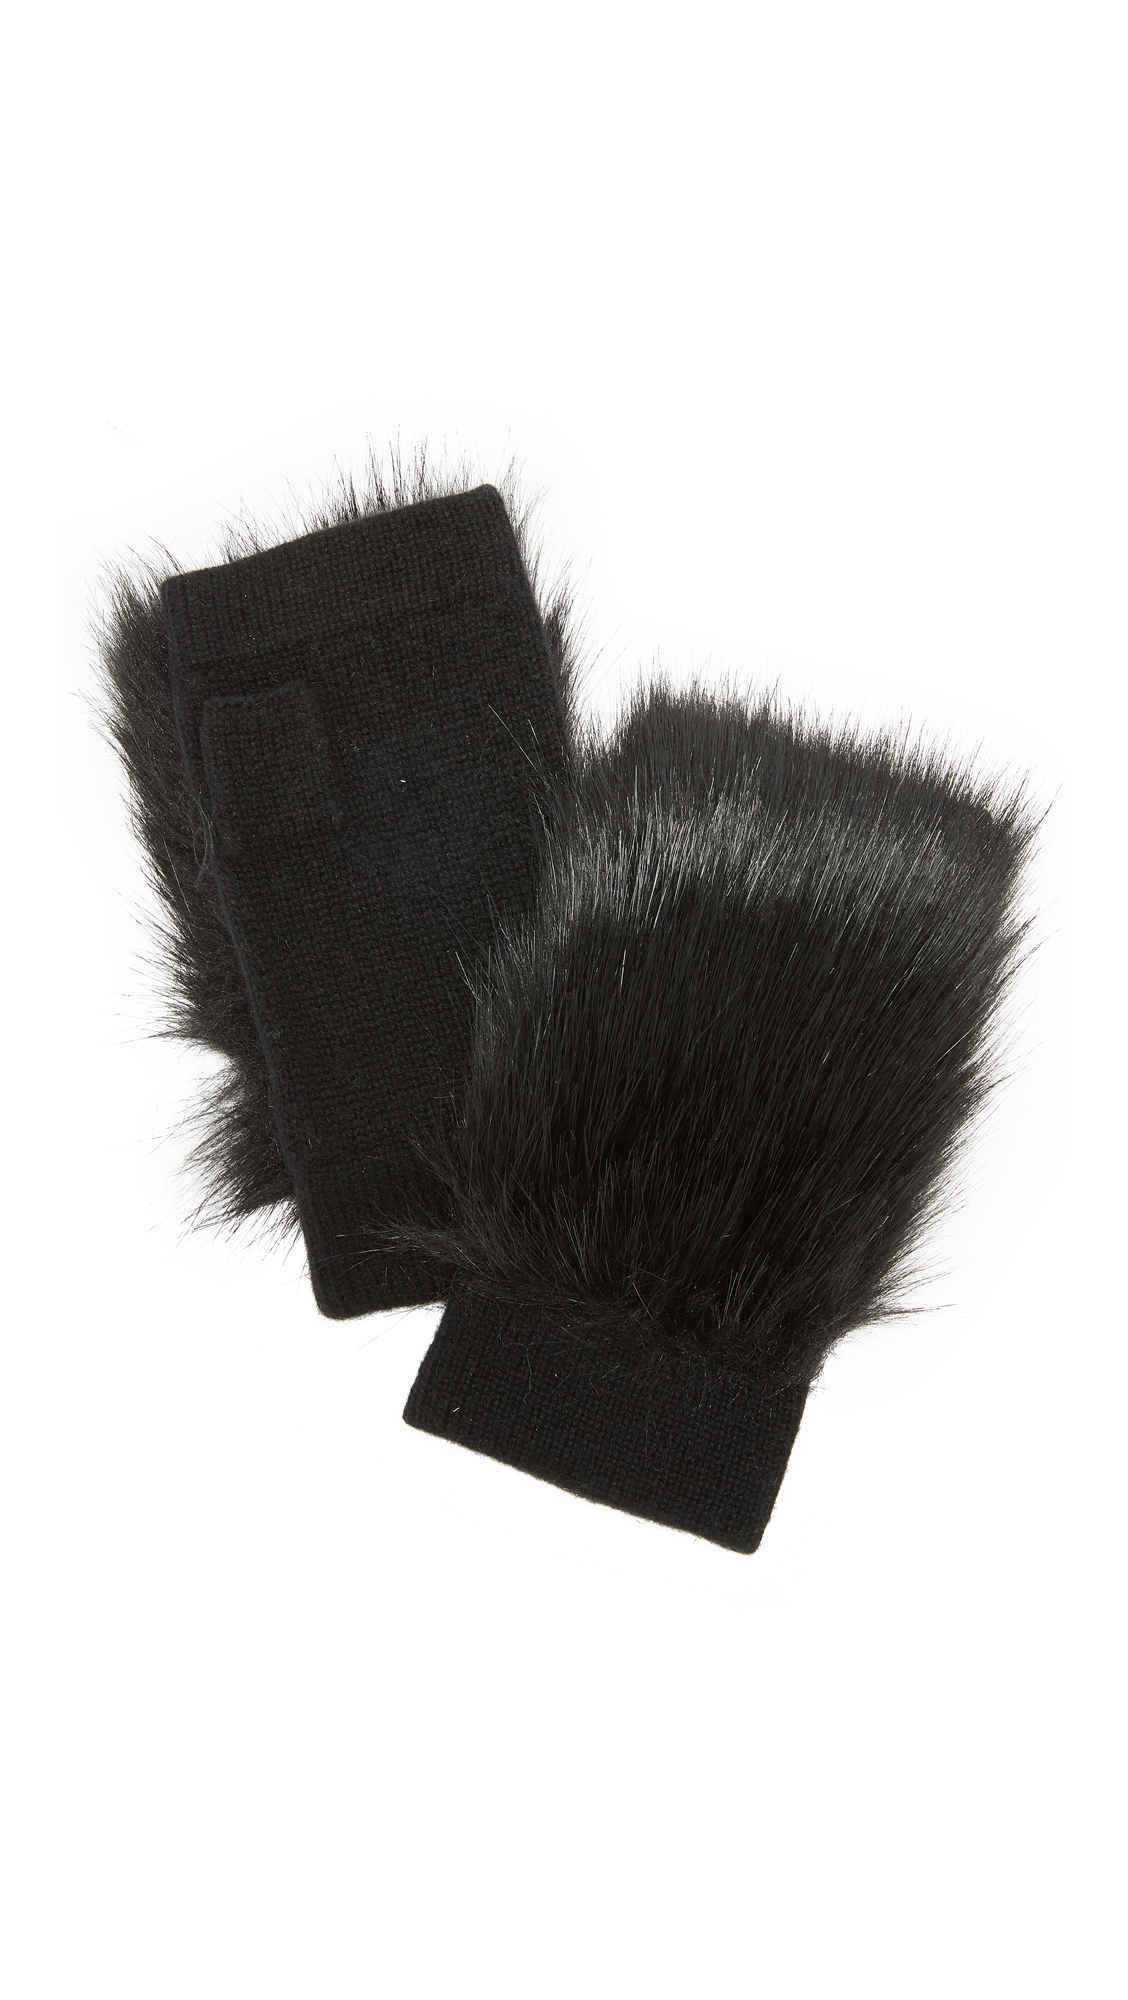 Carolina Amato Faux Fur Knit Fingerless Gloves - Black